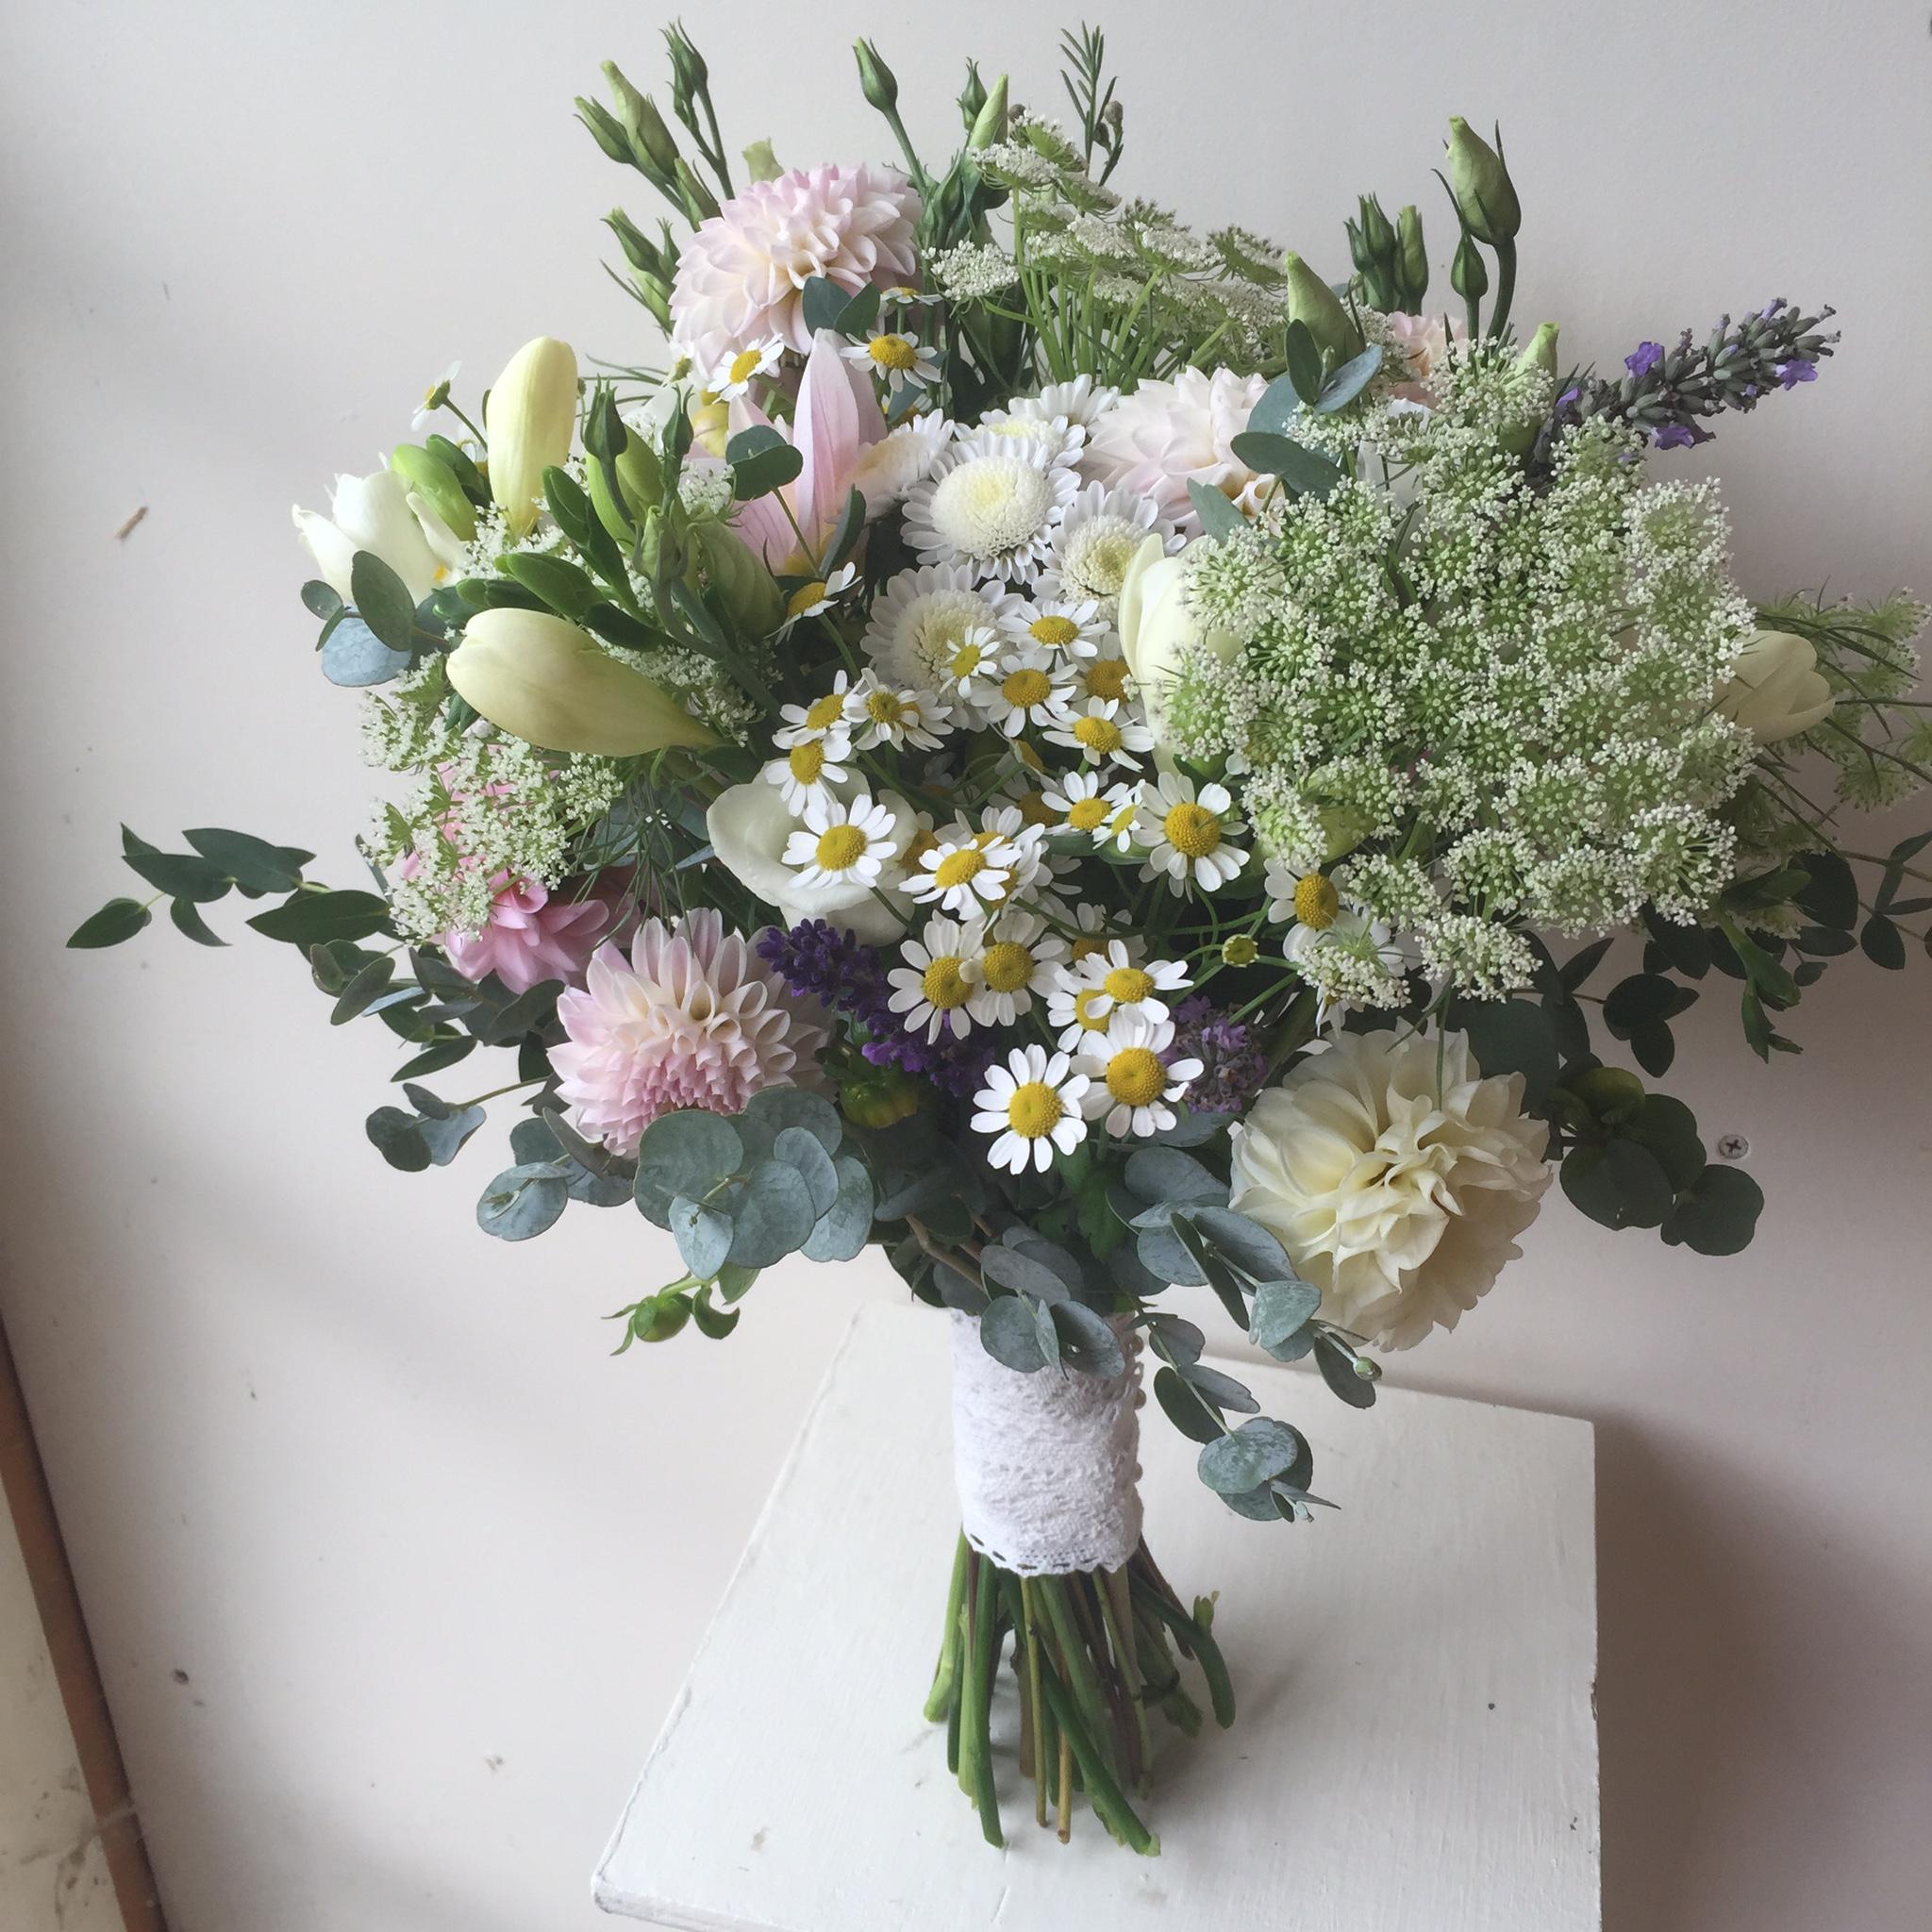 Bradford on avon, wedding flowers